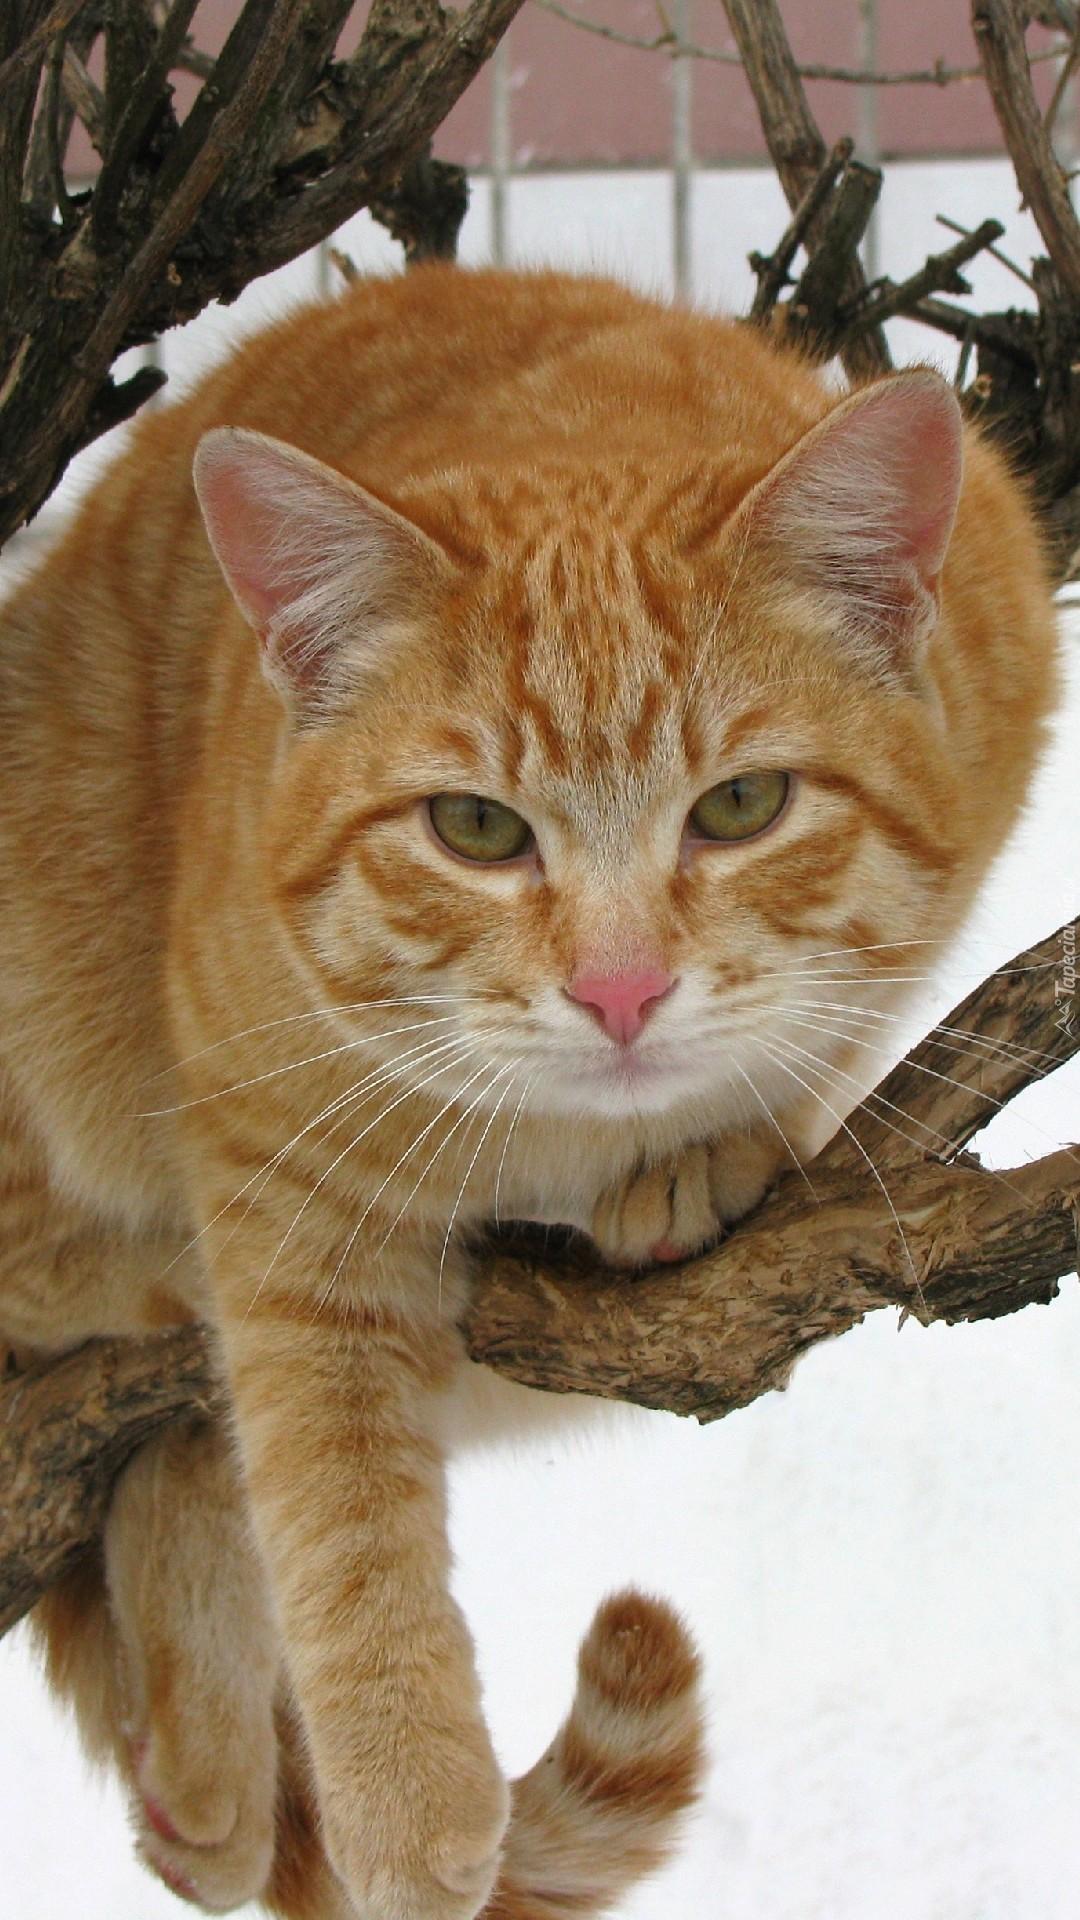 Rudy kot na gałęzi